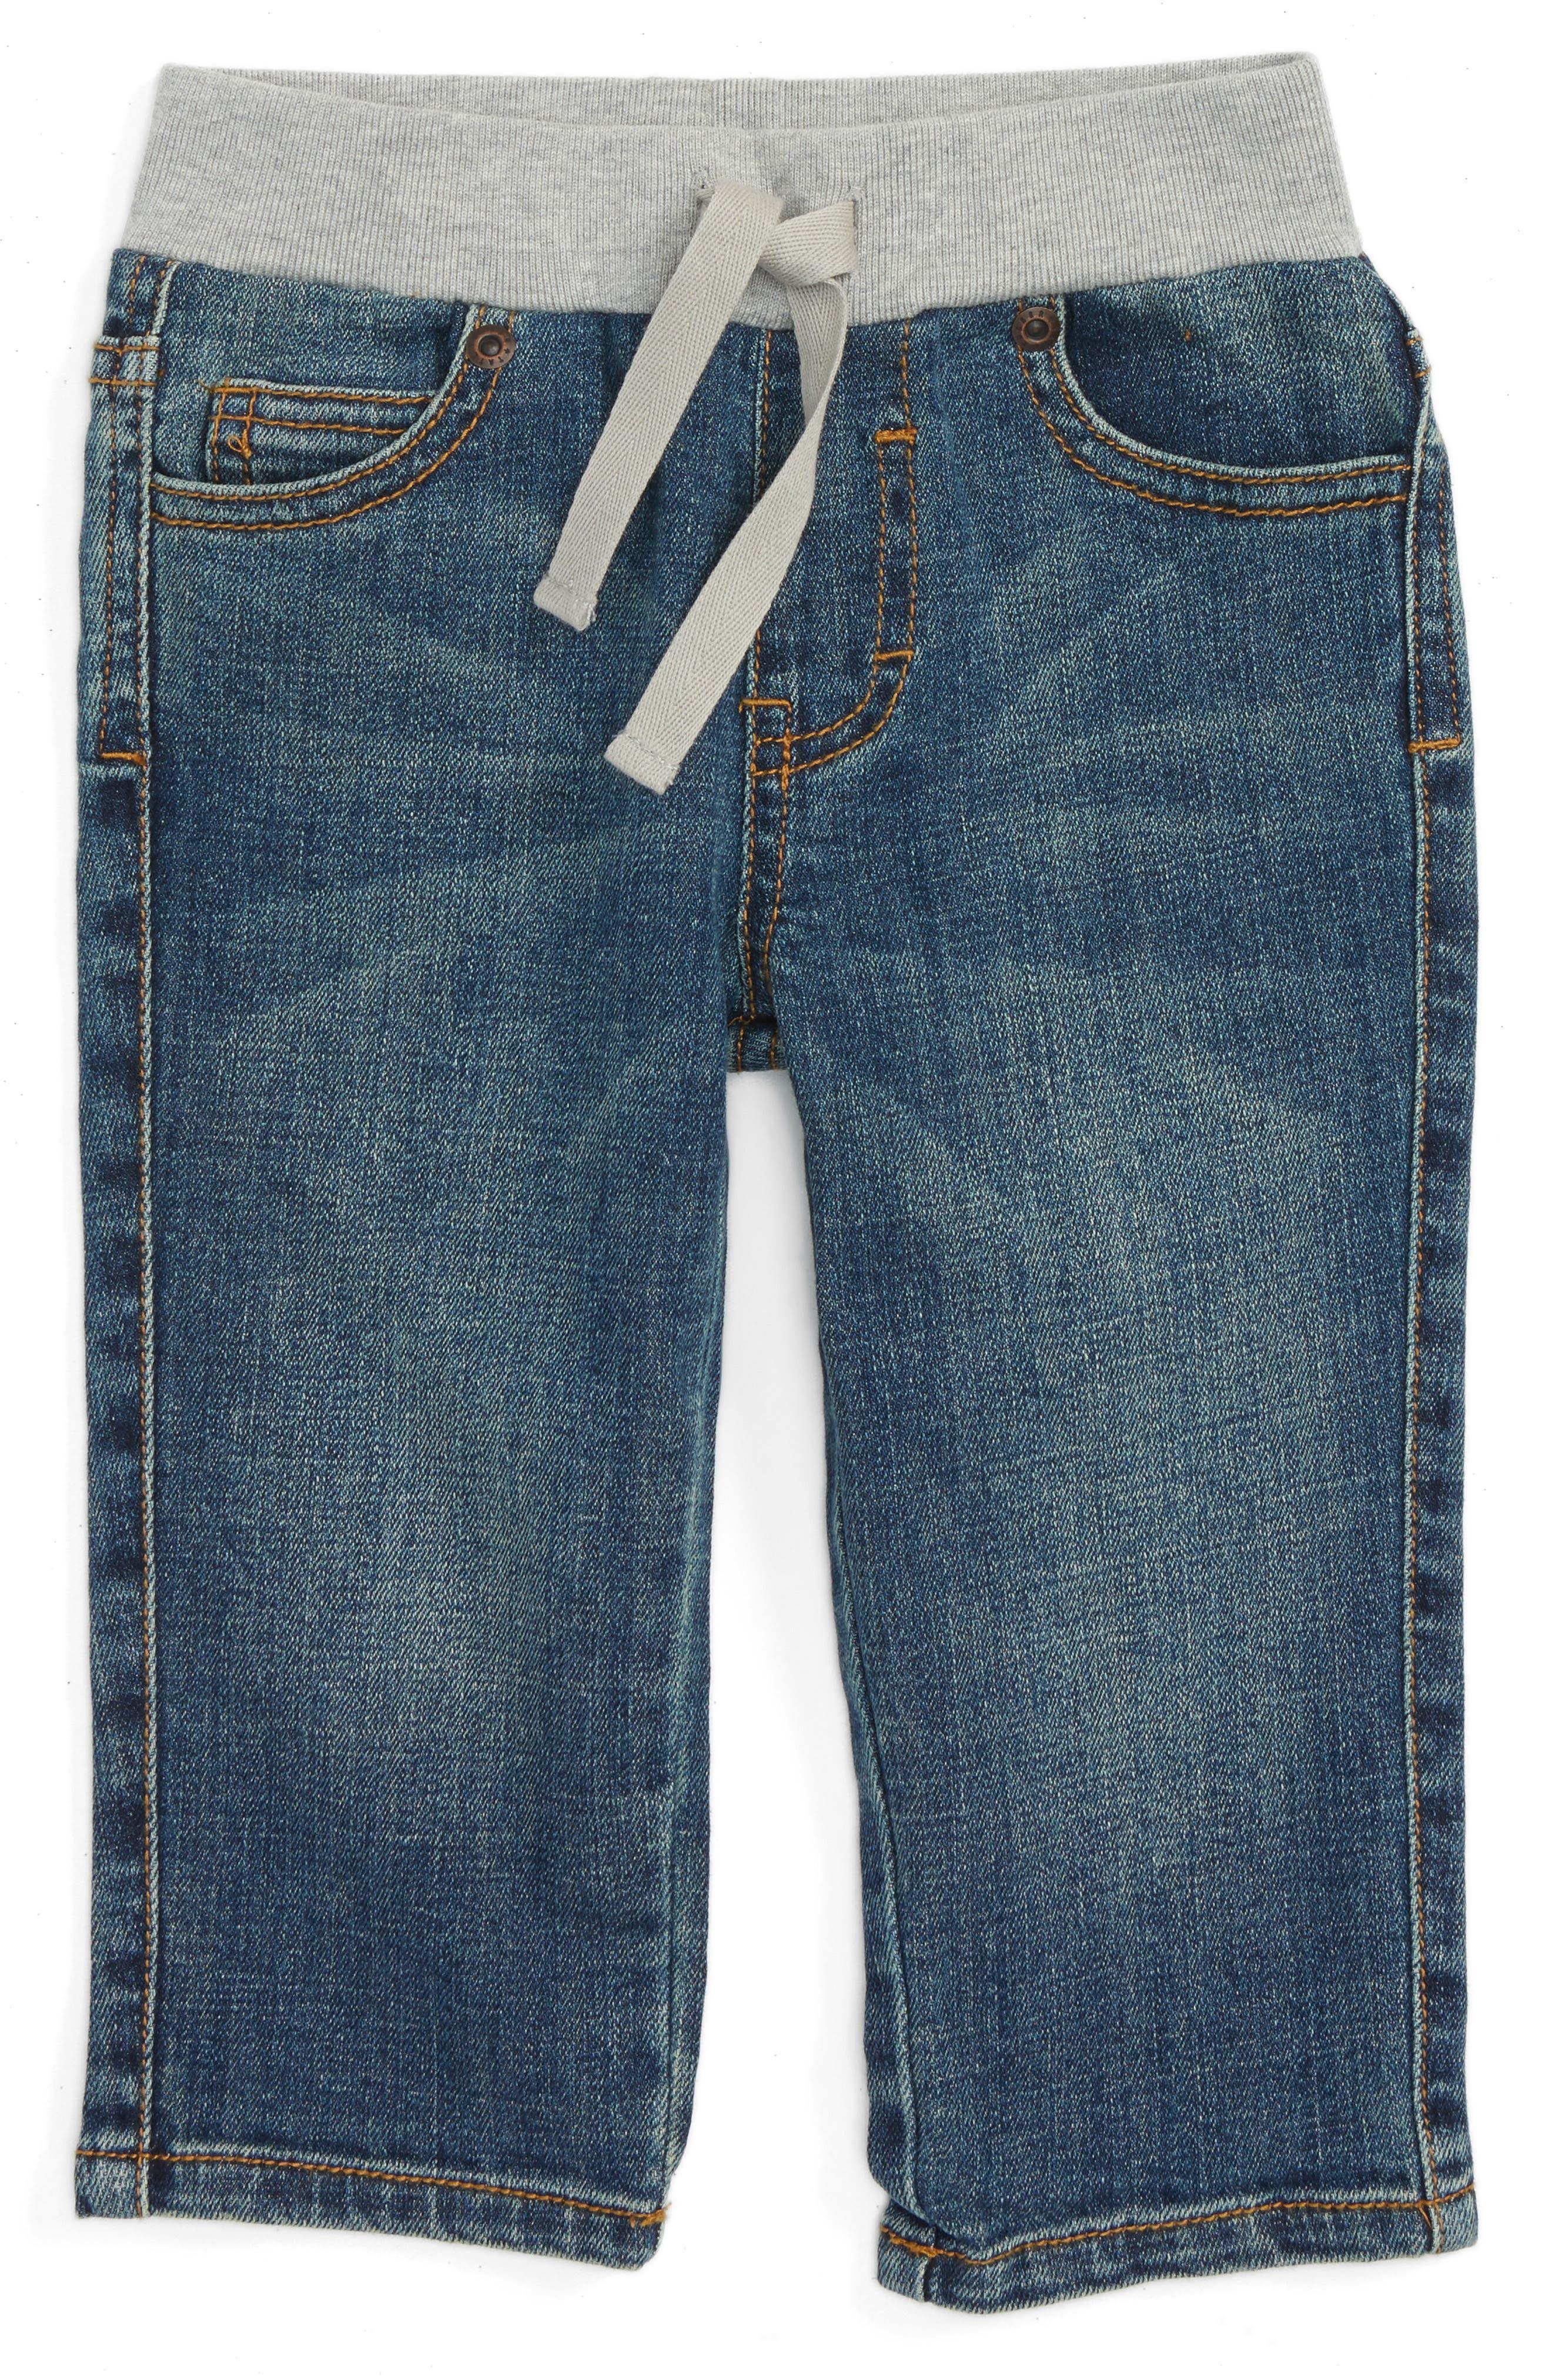 Tucker Jeans,                         Main,                         color, Trail Blazer Wash